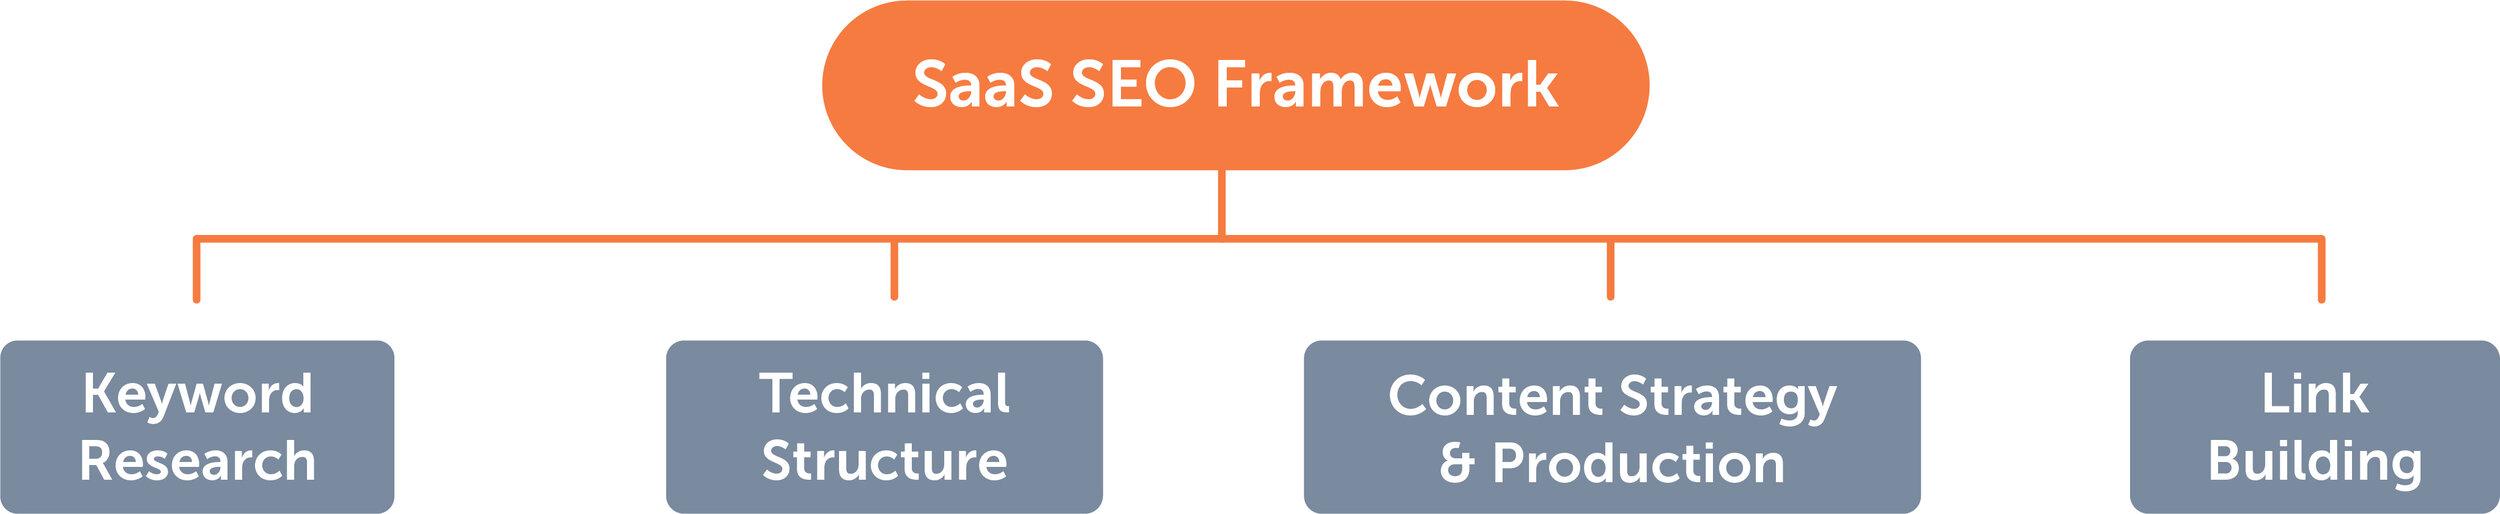 seo-framework-3.jpg